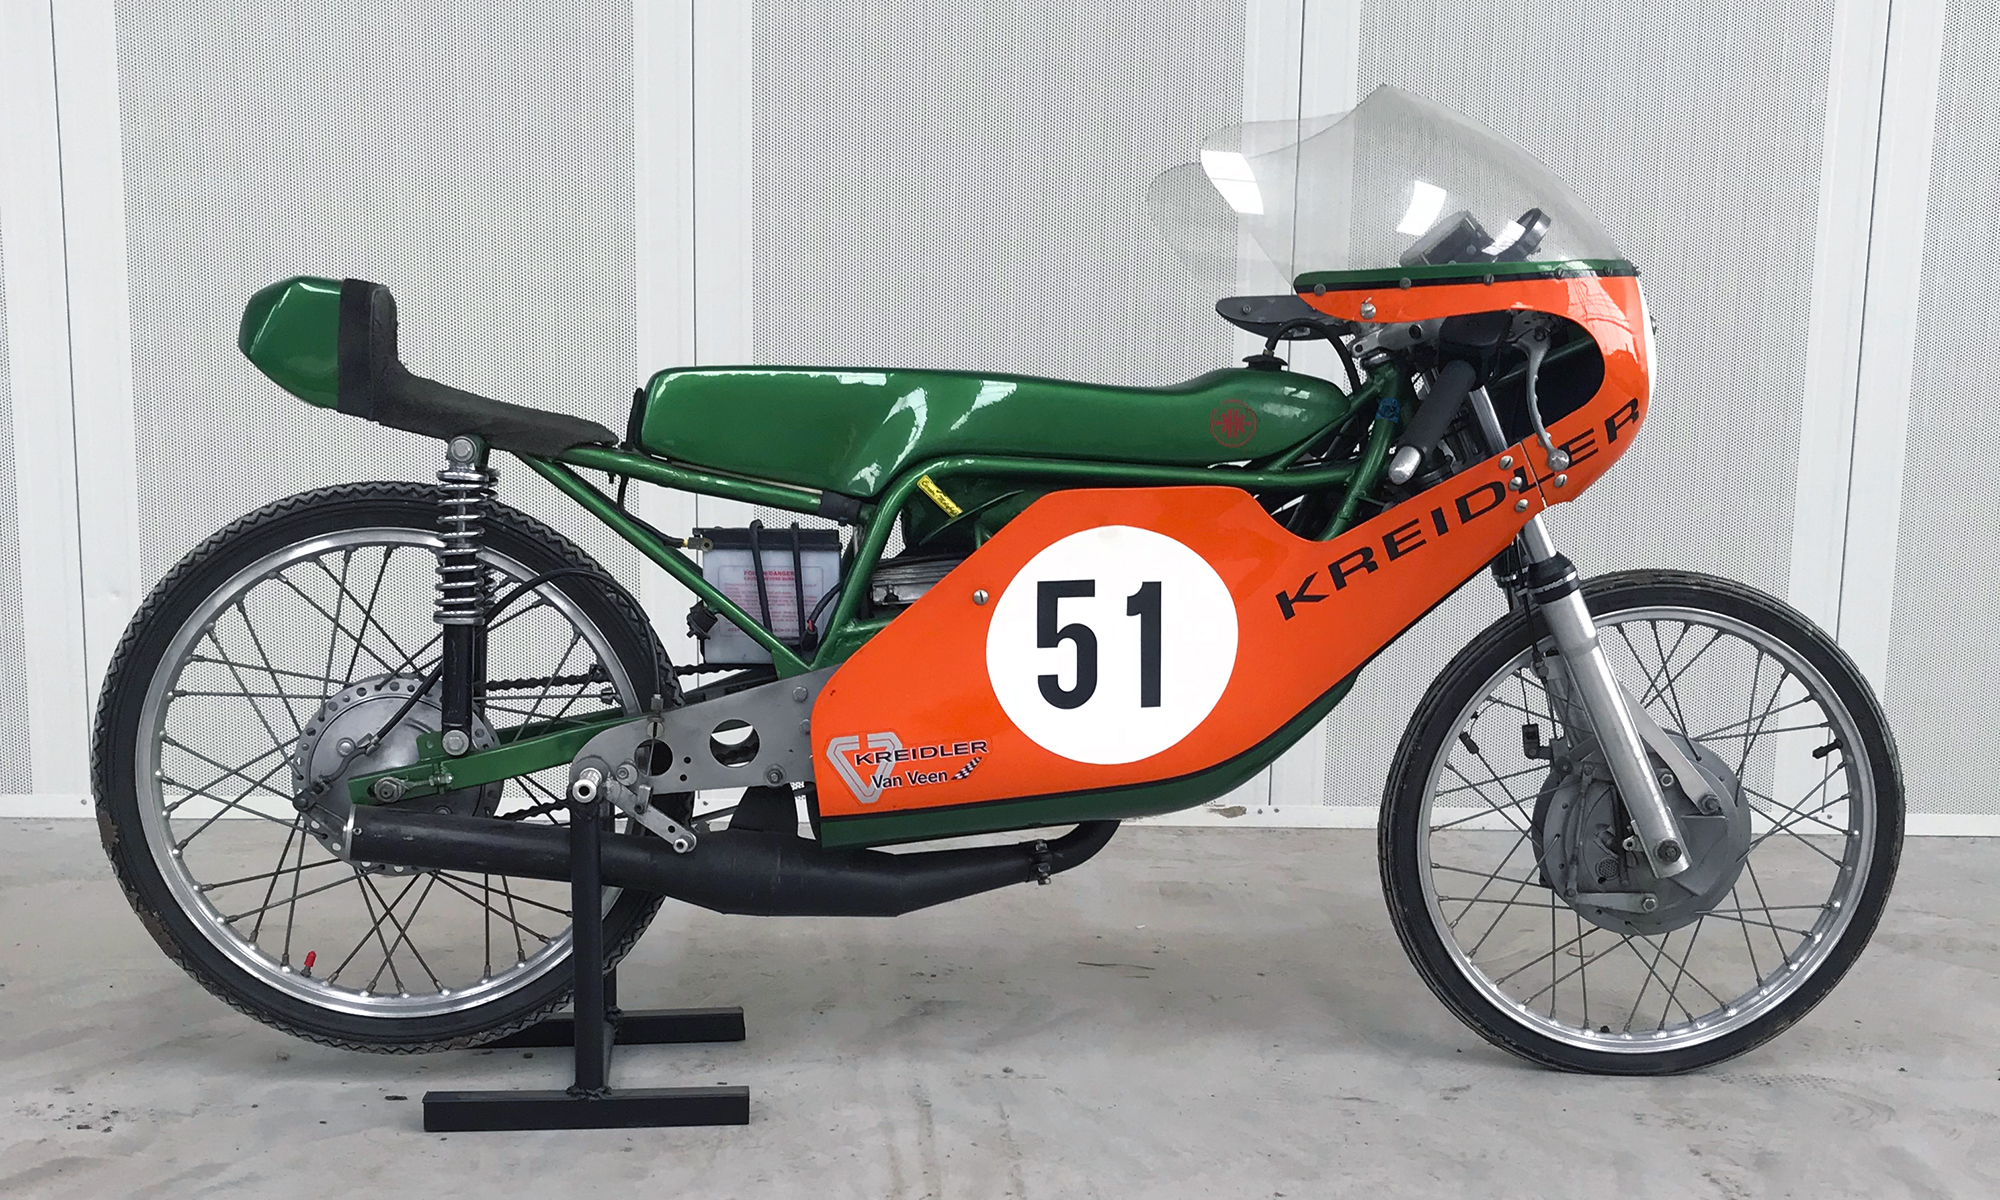 KRUK Motorcycle Shop